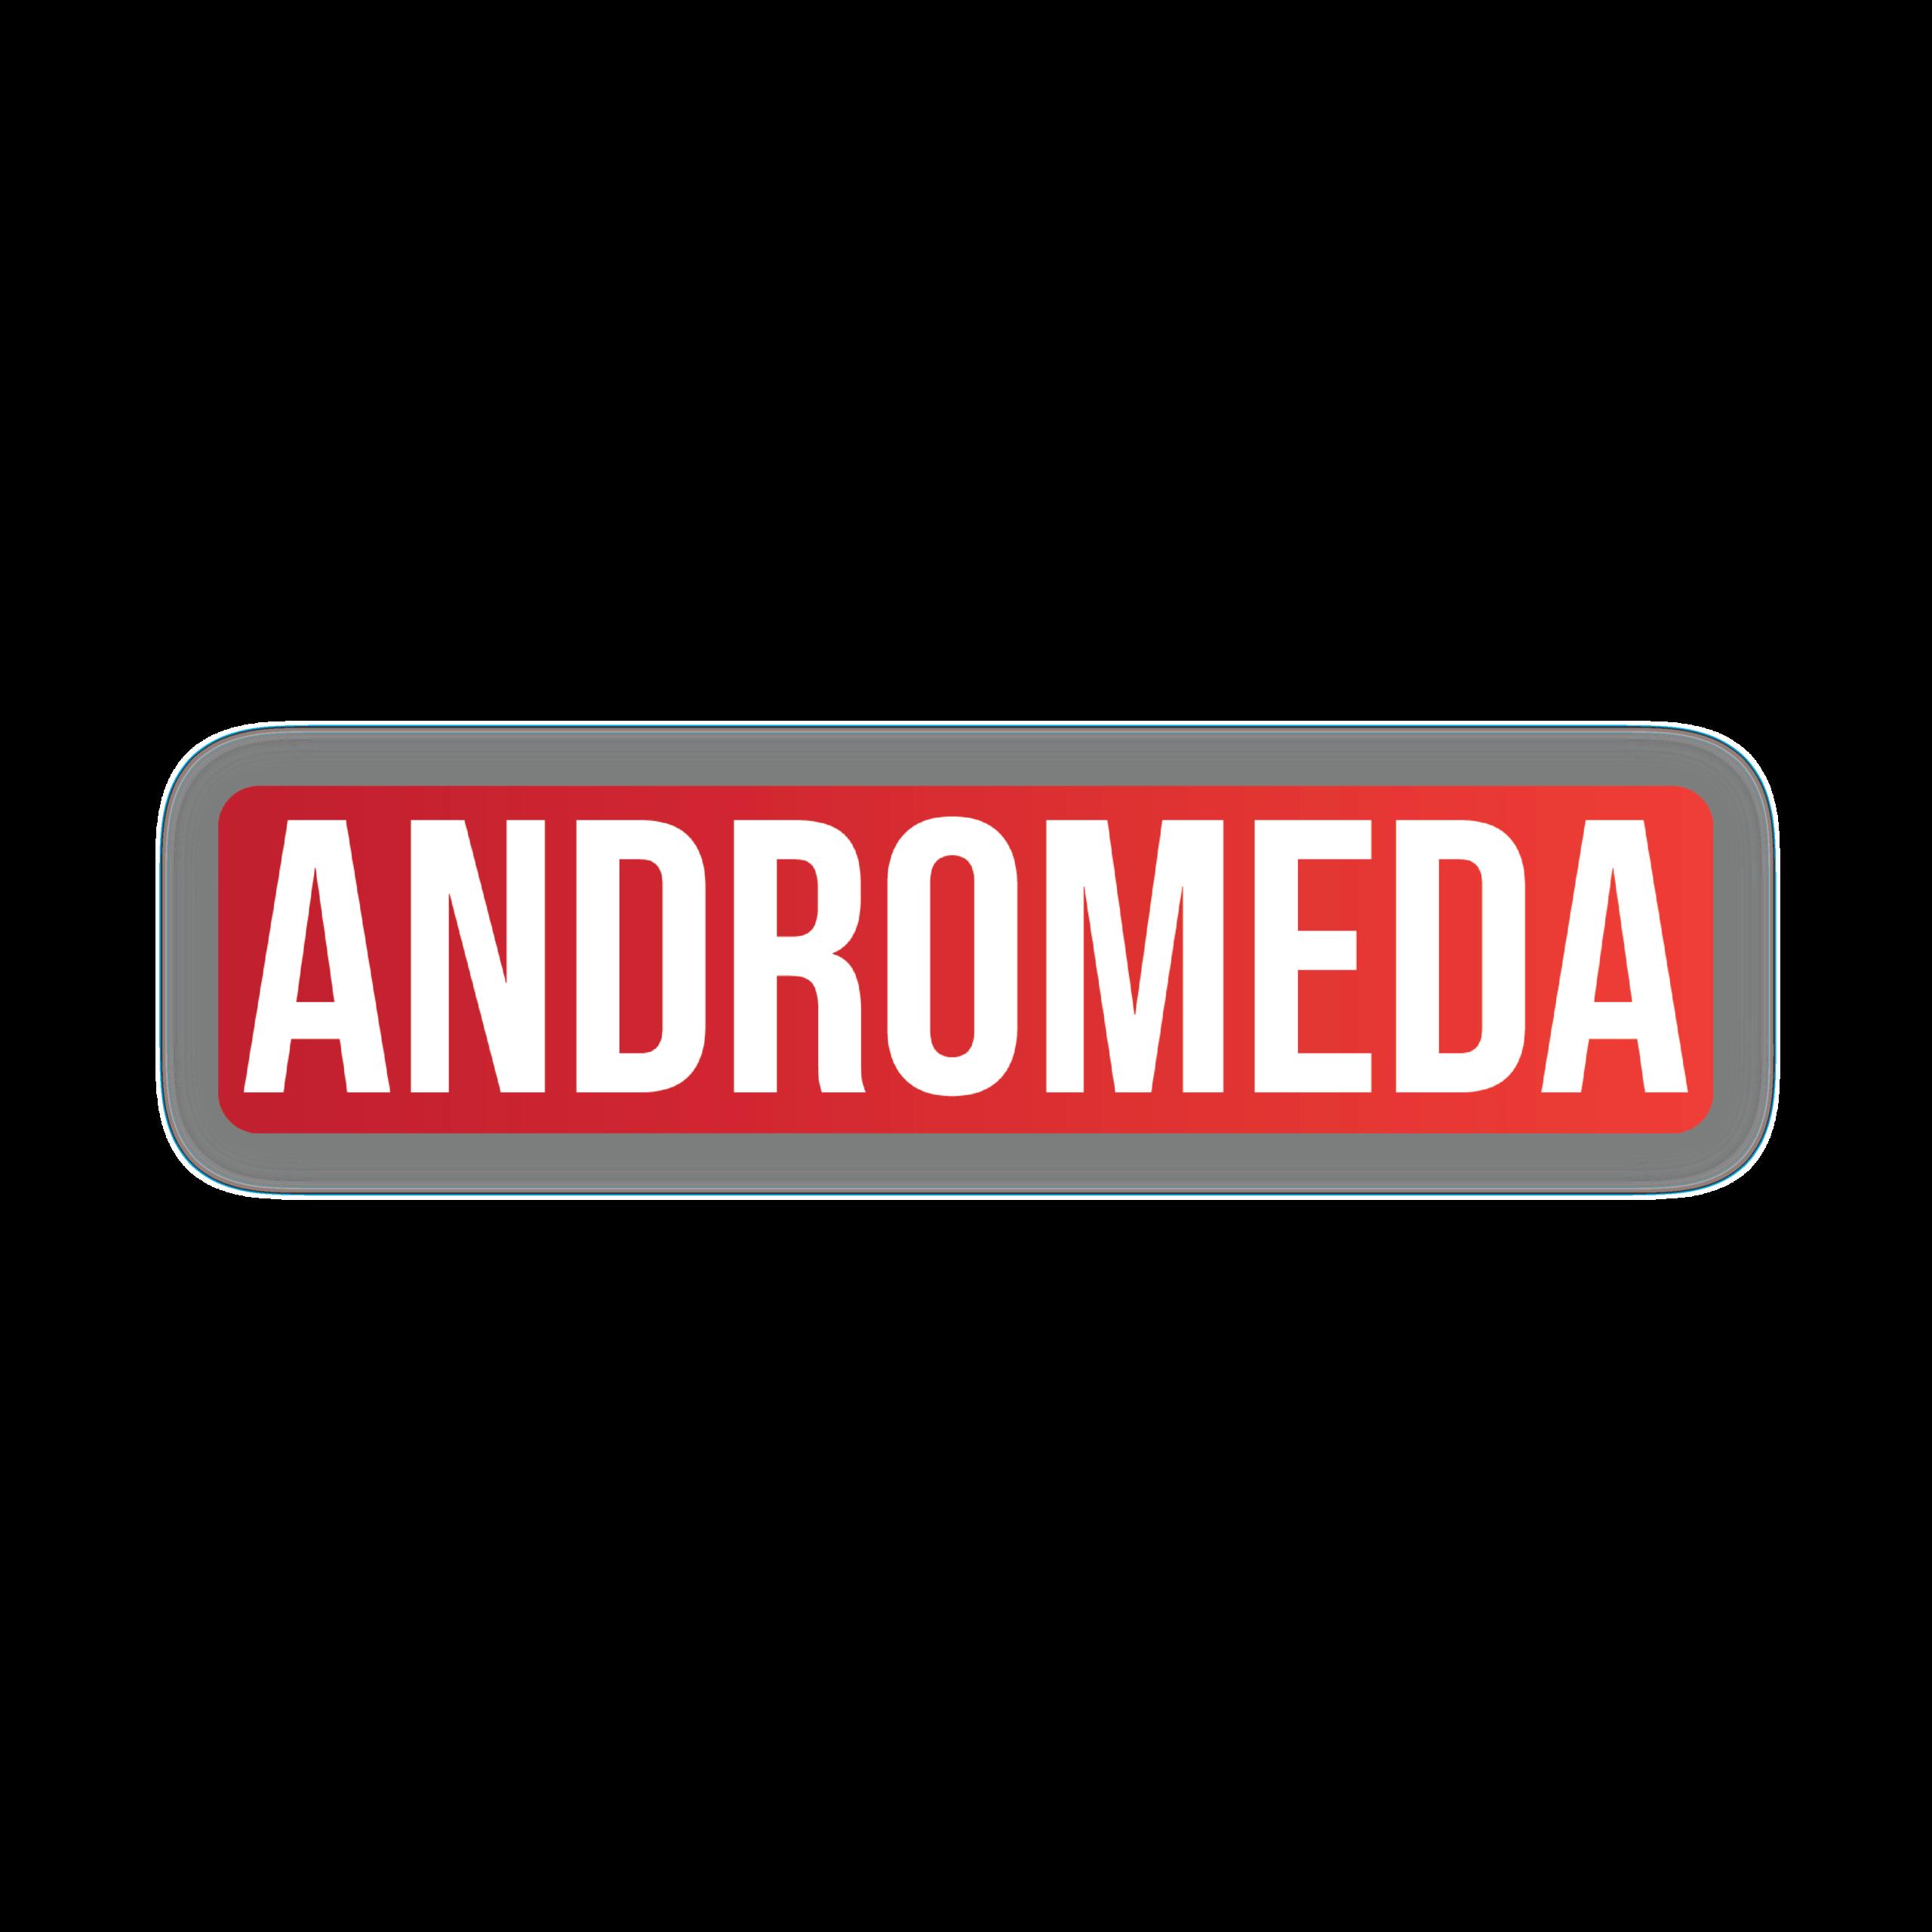 fi-es andromeda pms software